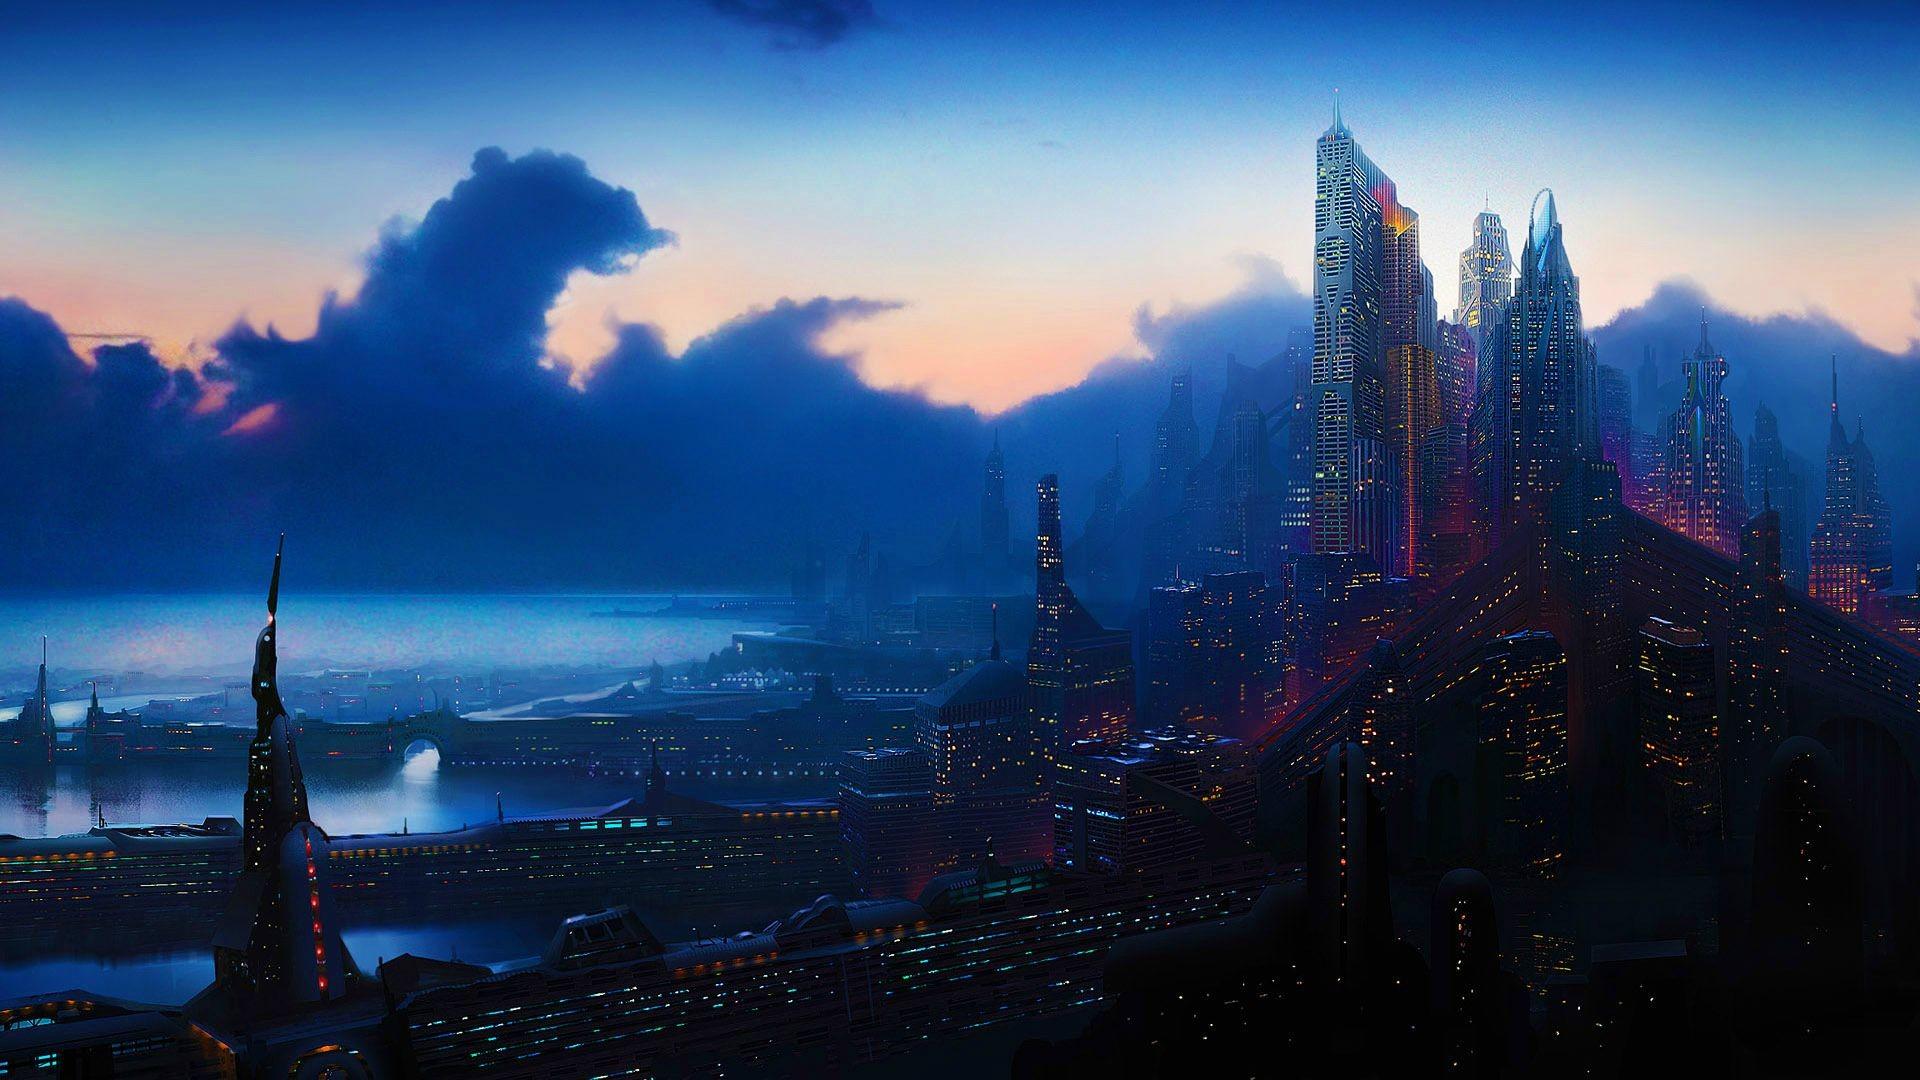 Space City Live Wallpaper